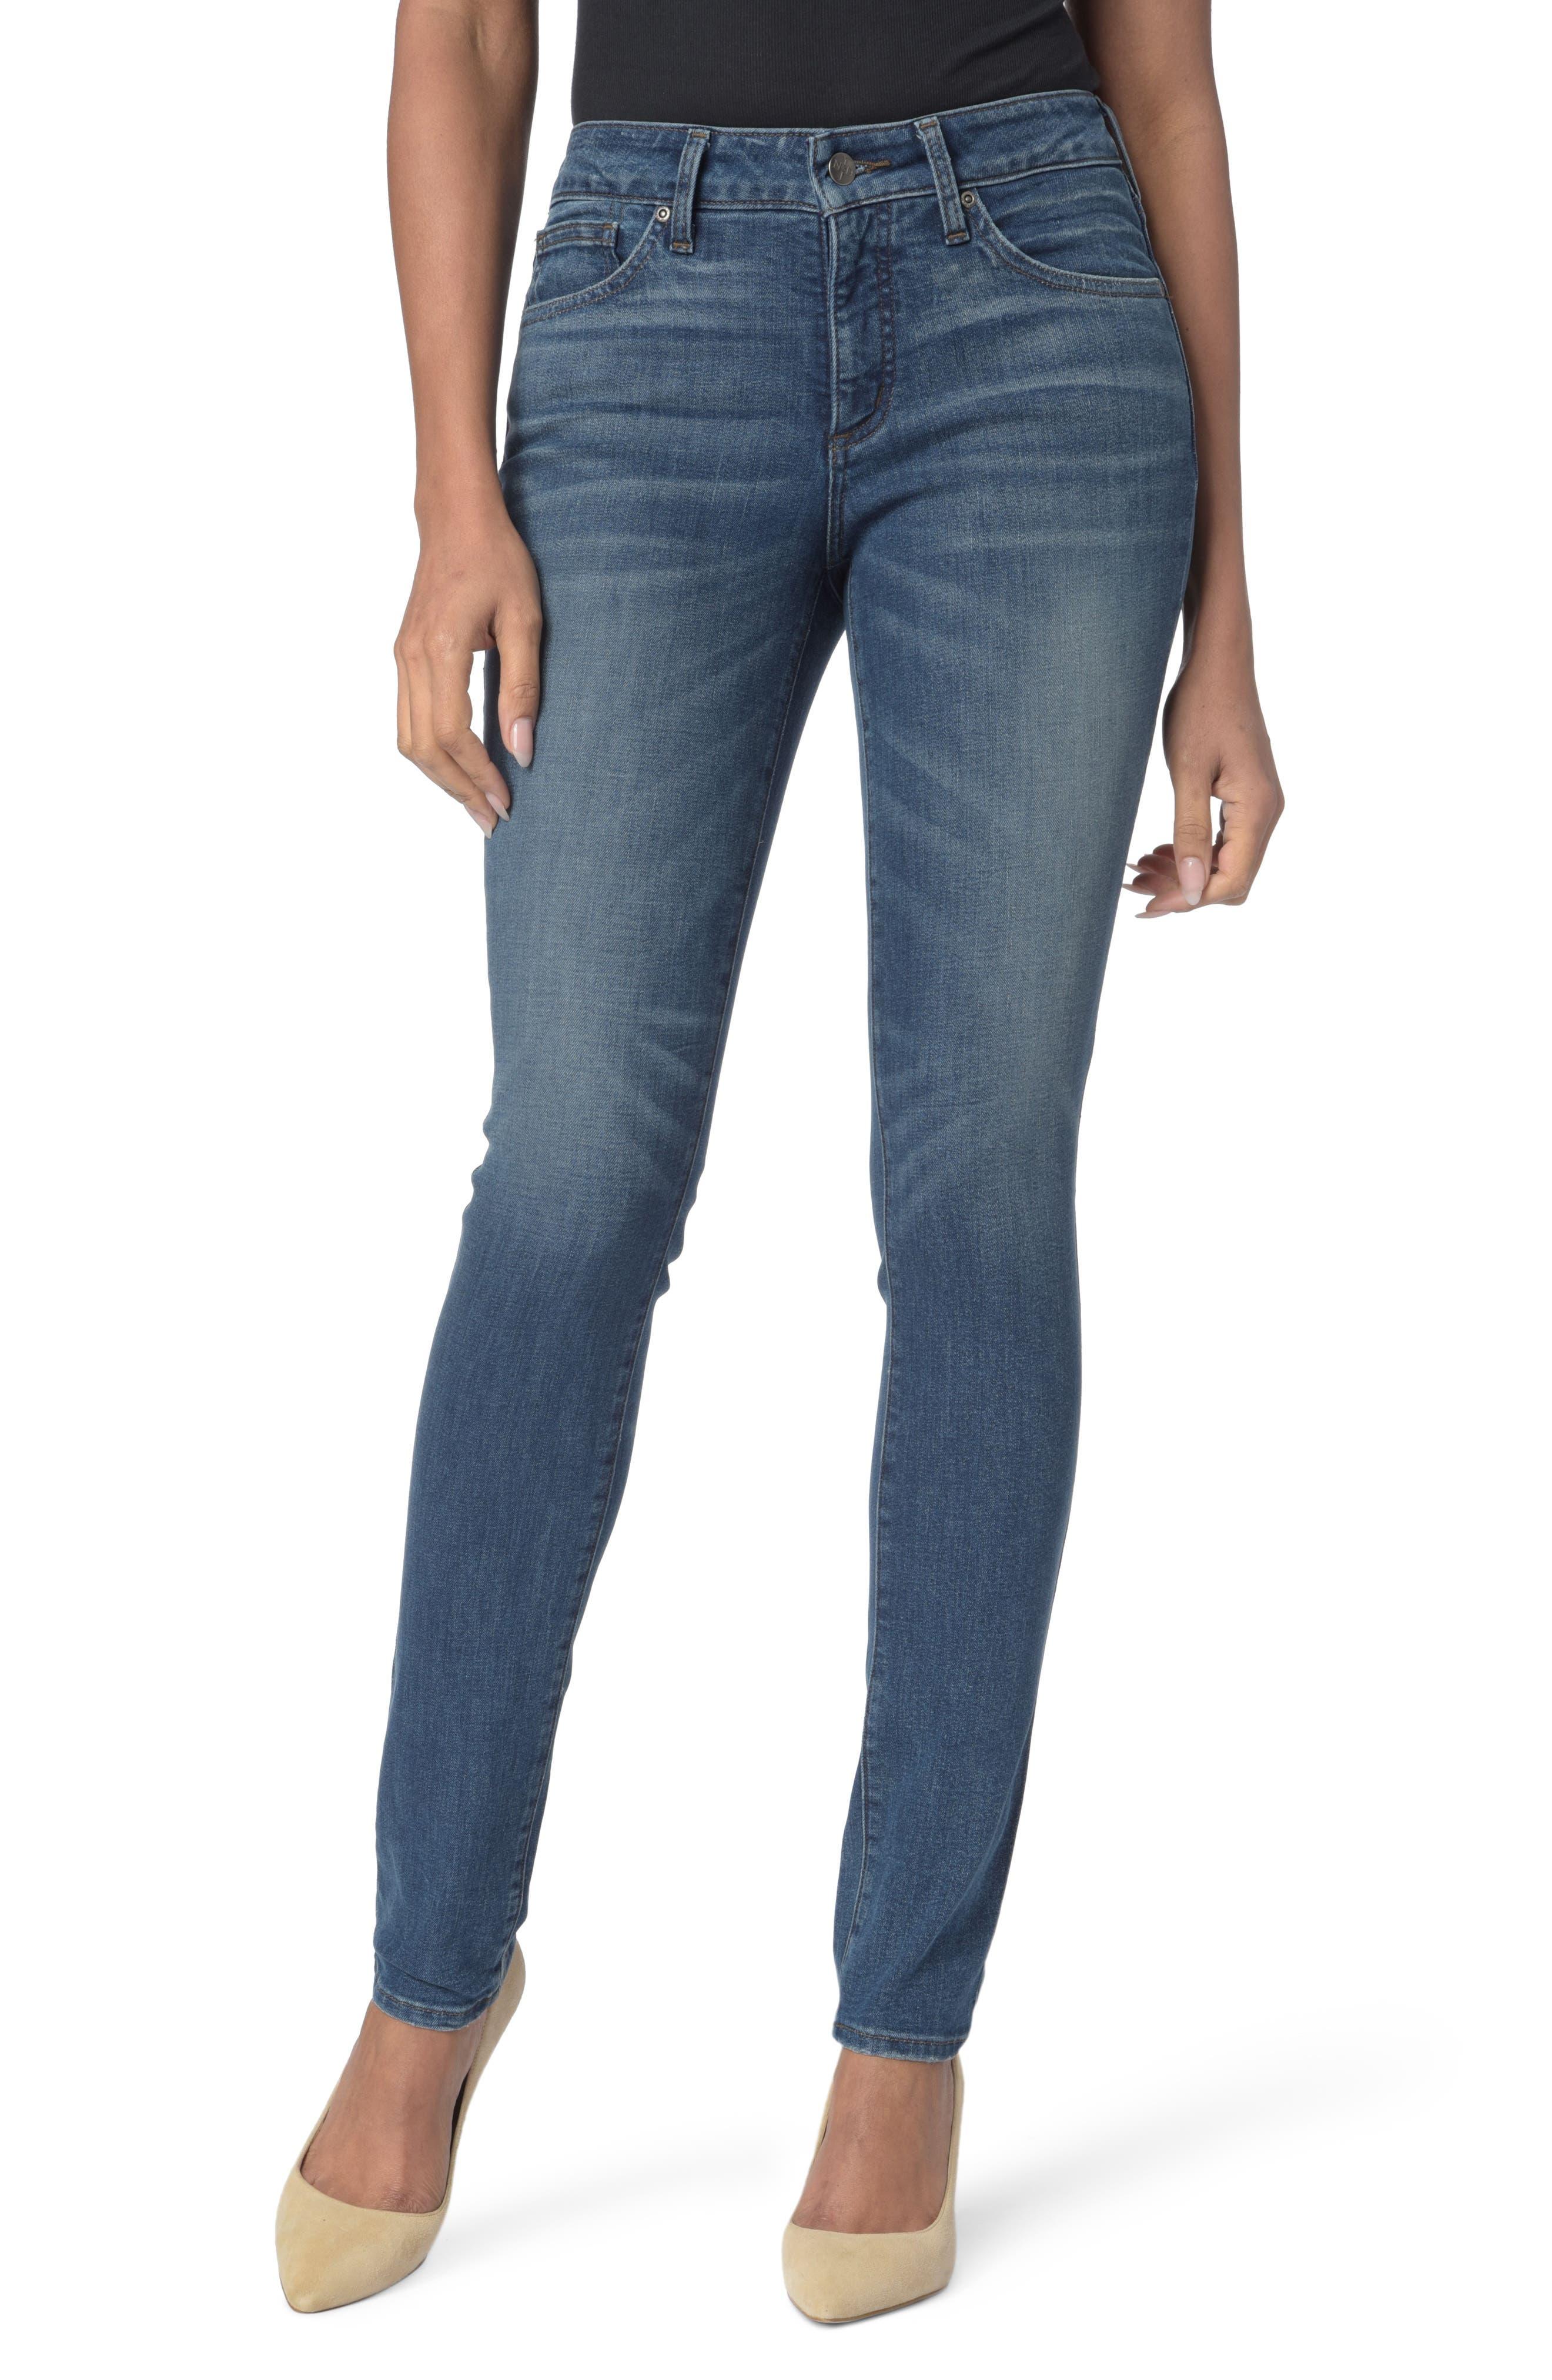 Alternate Image 1 Selected - NYDJ Alina Stretch Skinny Jeans